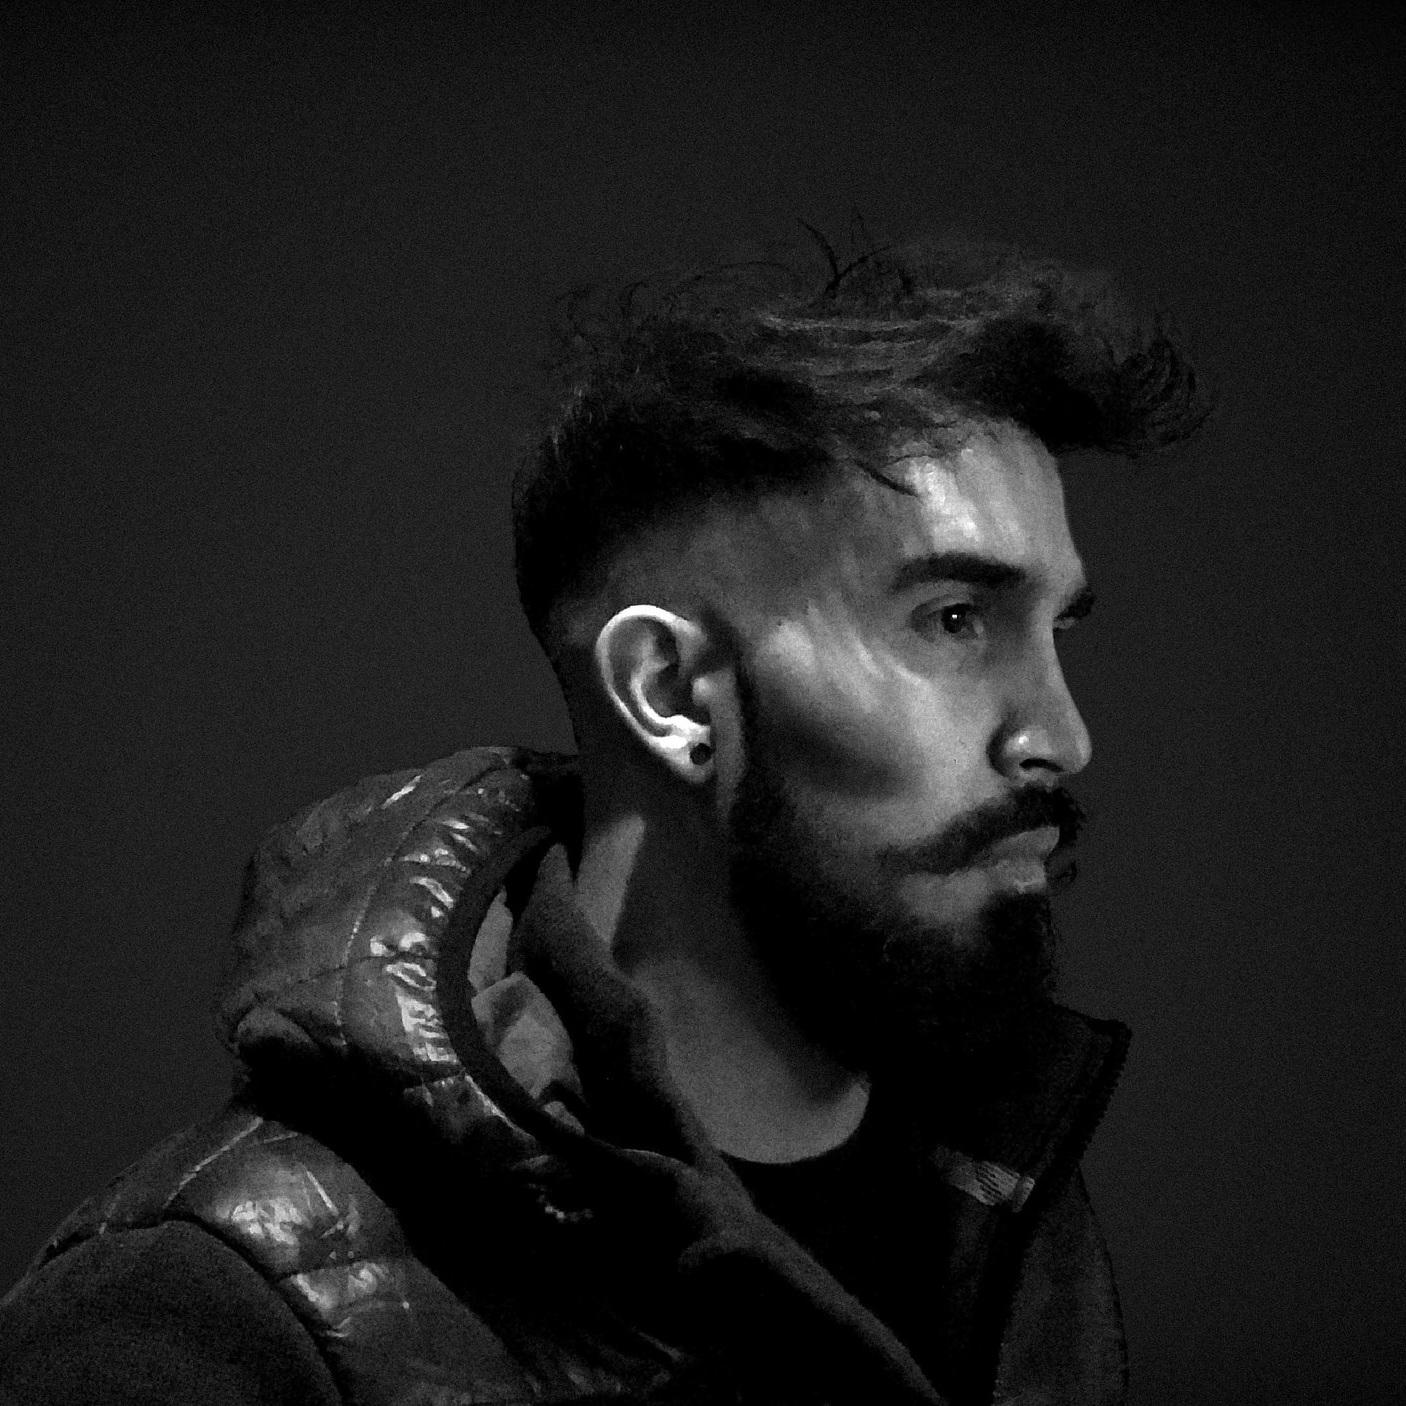 DOGCAST 012 Artist: STARK D Genre: Melodic Techno/Deep Tech/Minimal Country: Brazil - Italy - UK